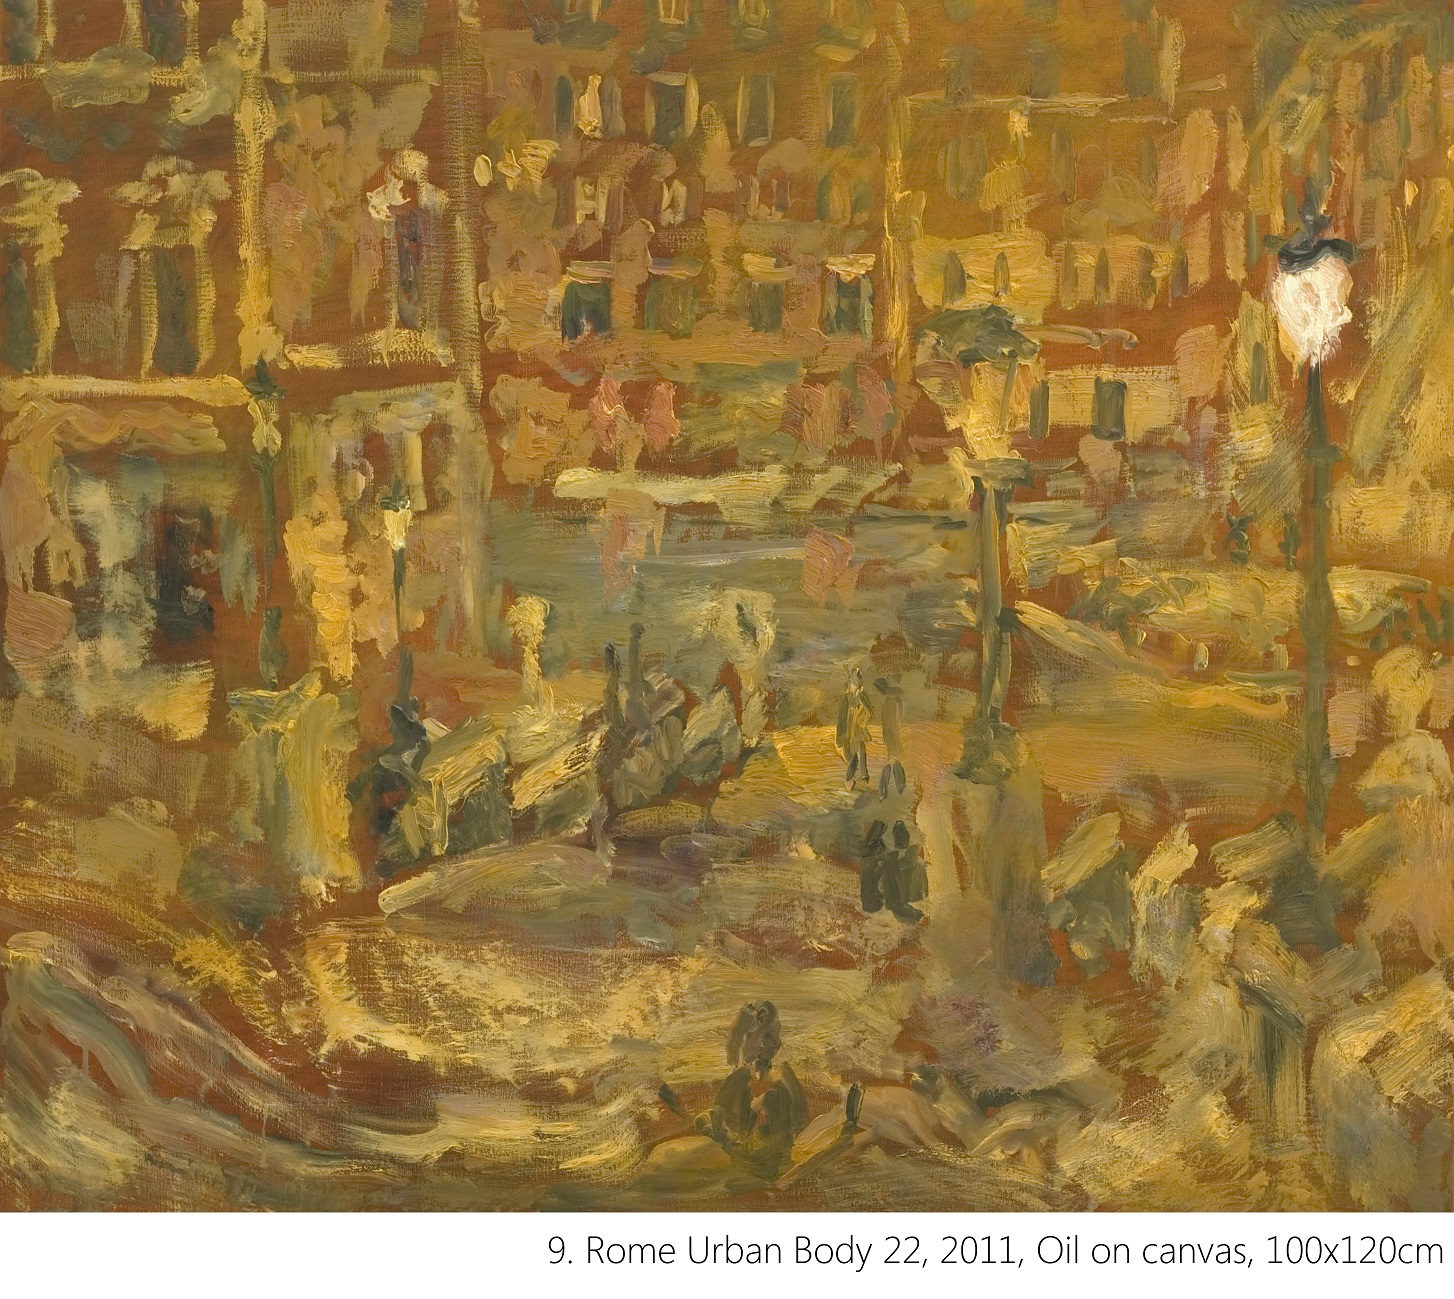 9. Rome Urban Body 22, 2011, Oil on canvas, 100x120cm